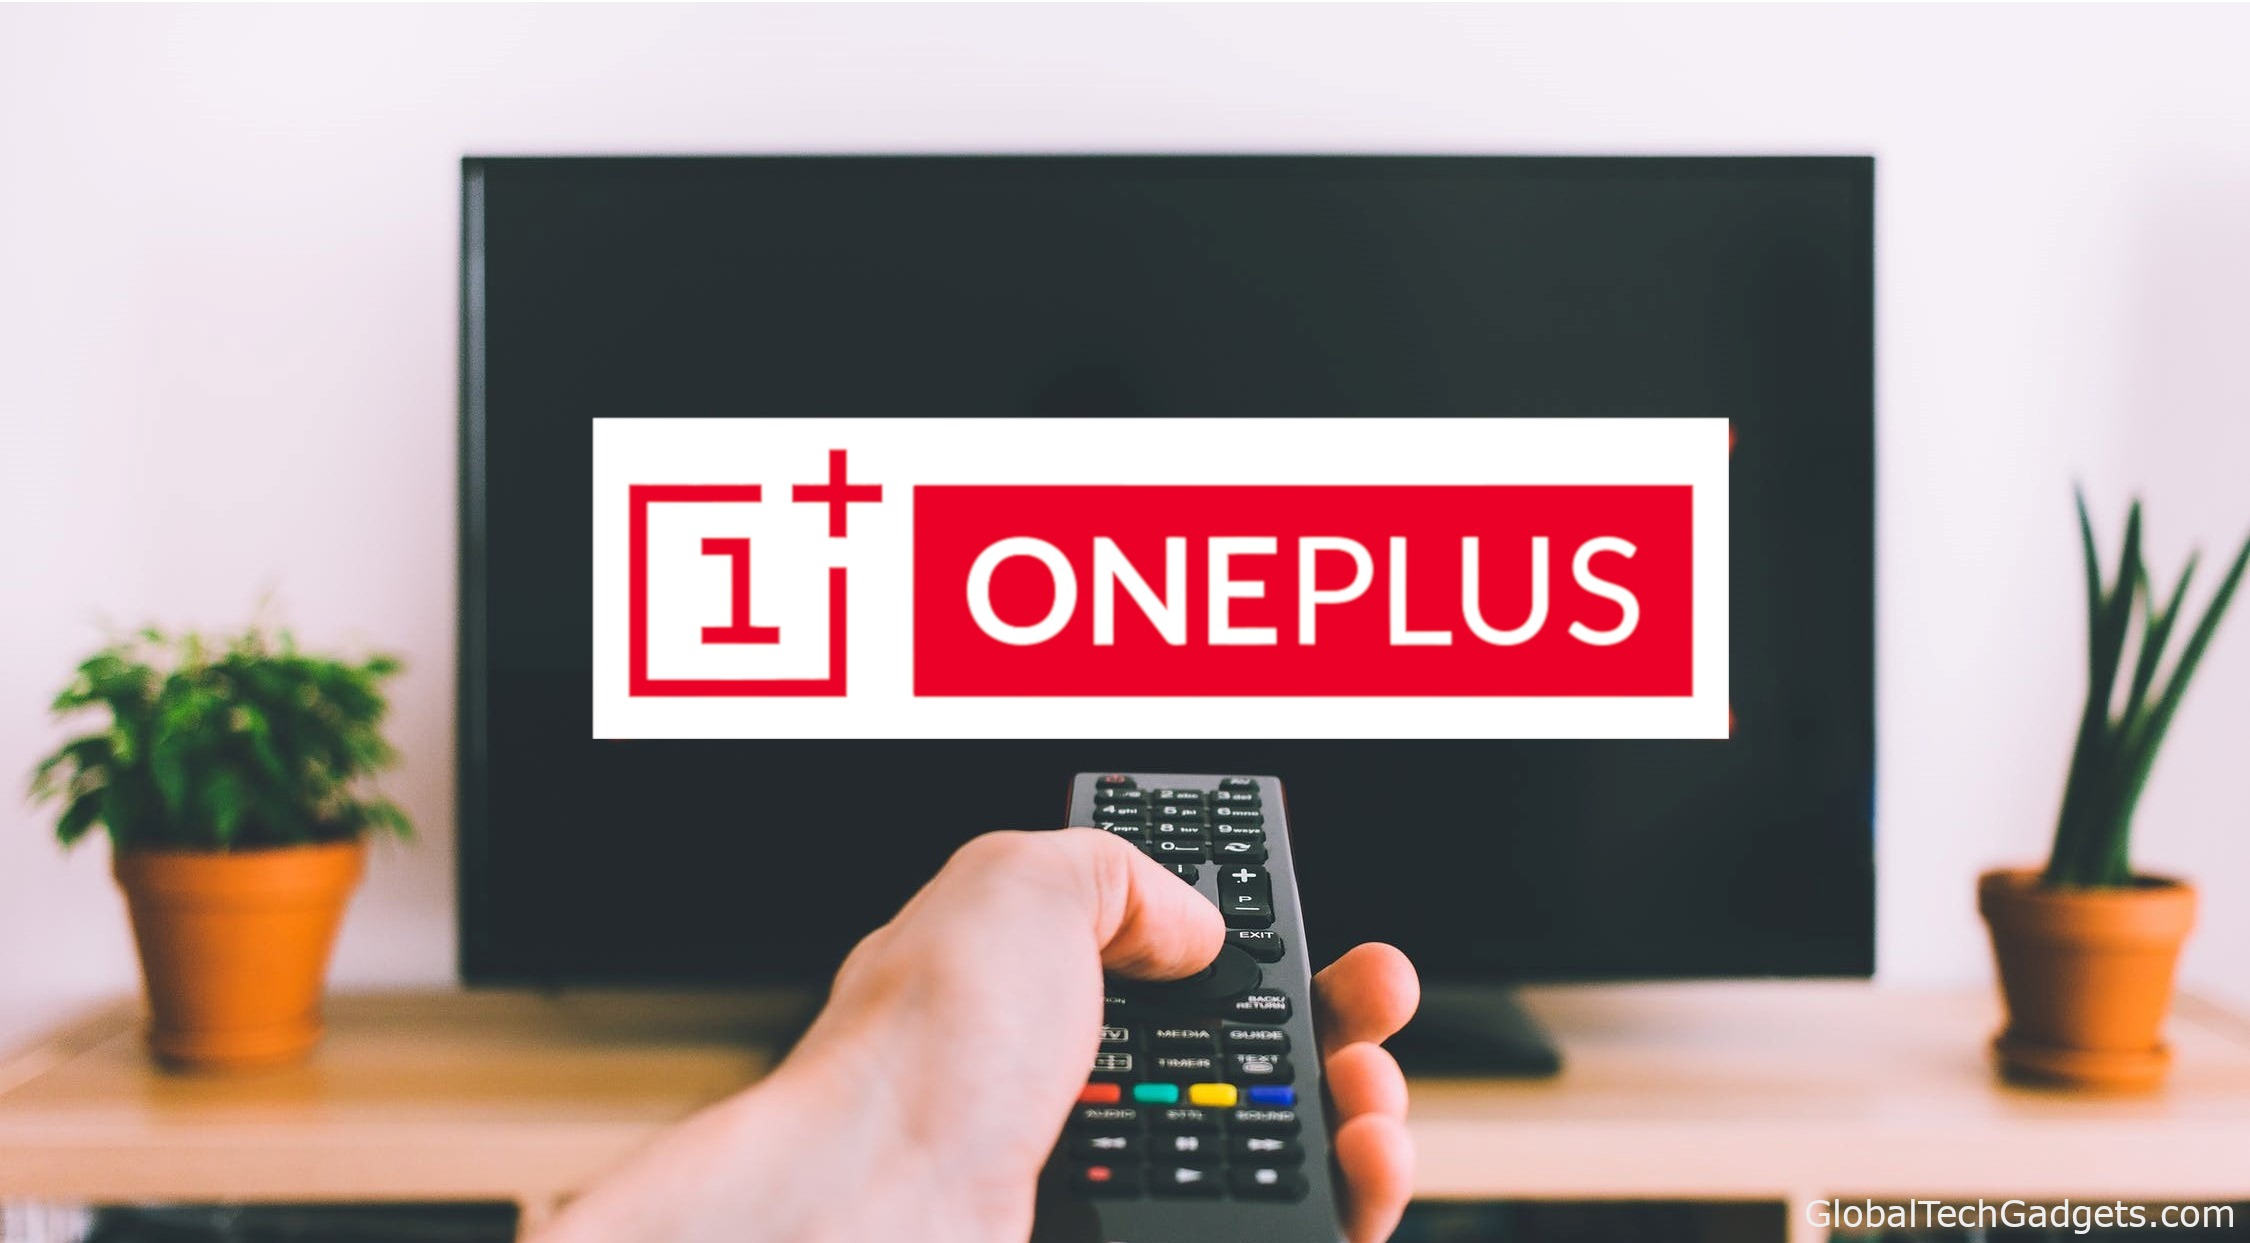 OnePlus Smart TV in Development, Launch expected in 2019